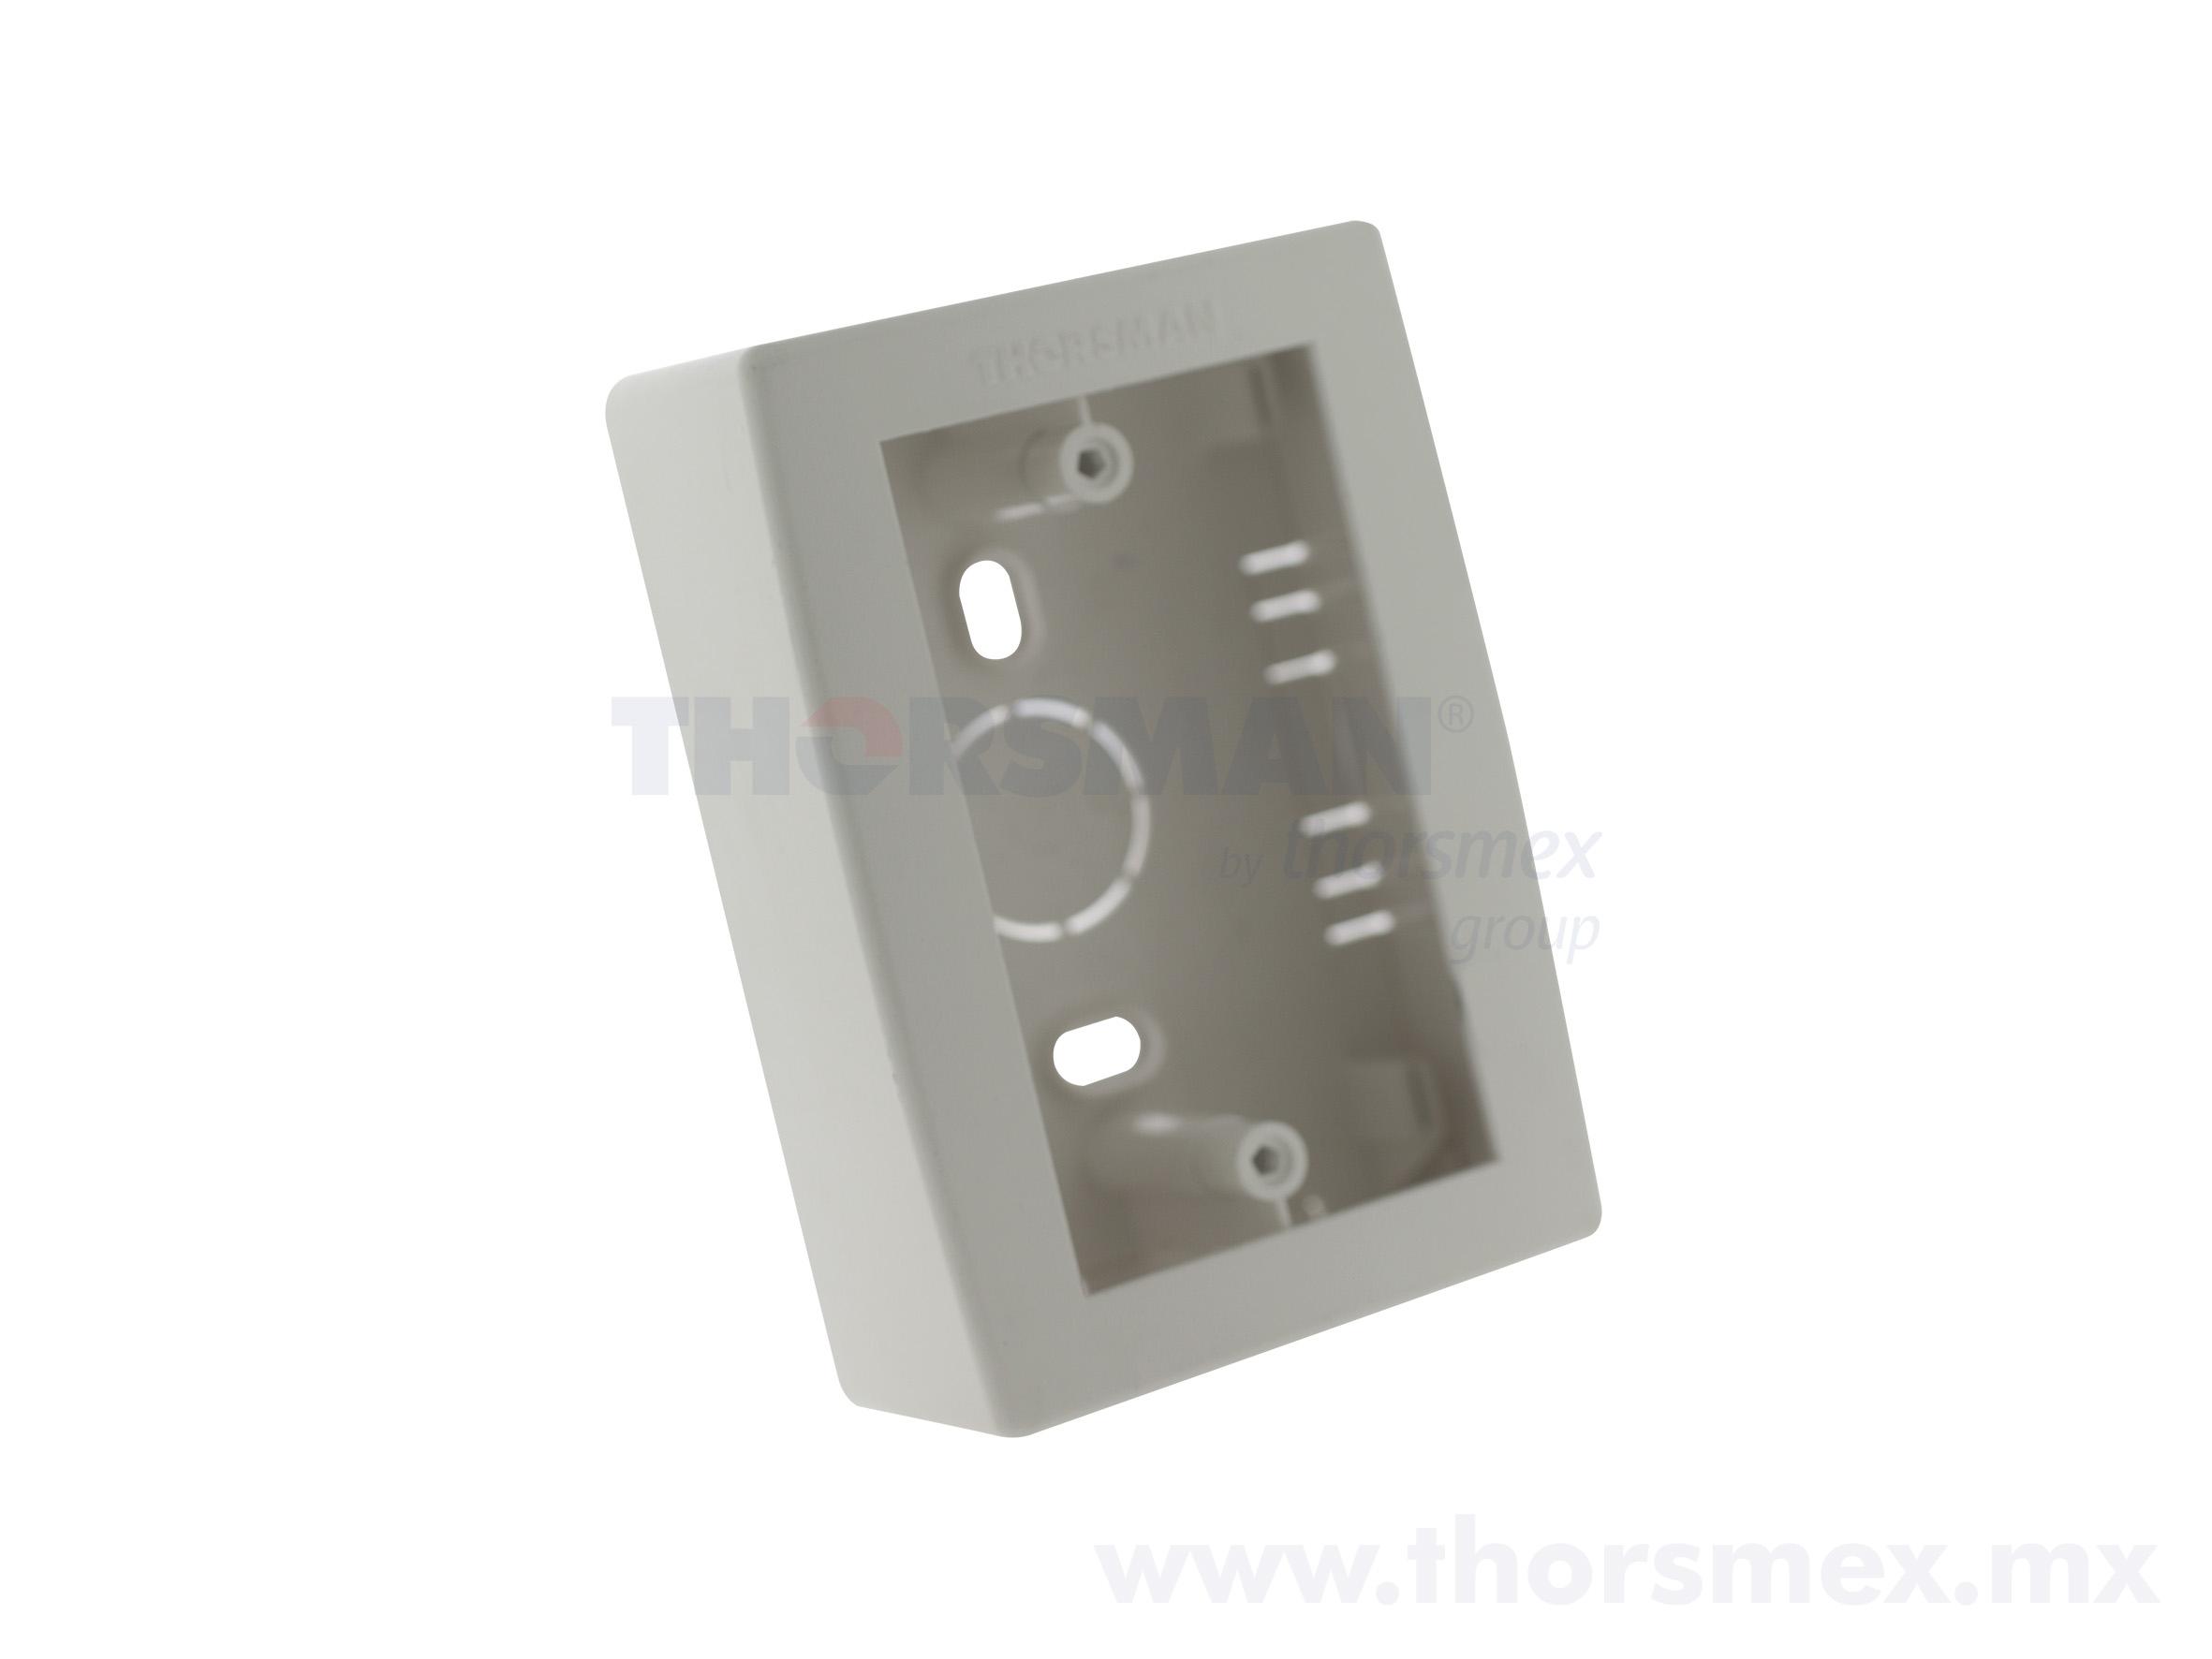 caja-tmk-s1-auto-extinguible-baja-8